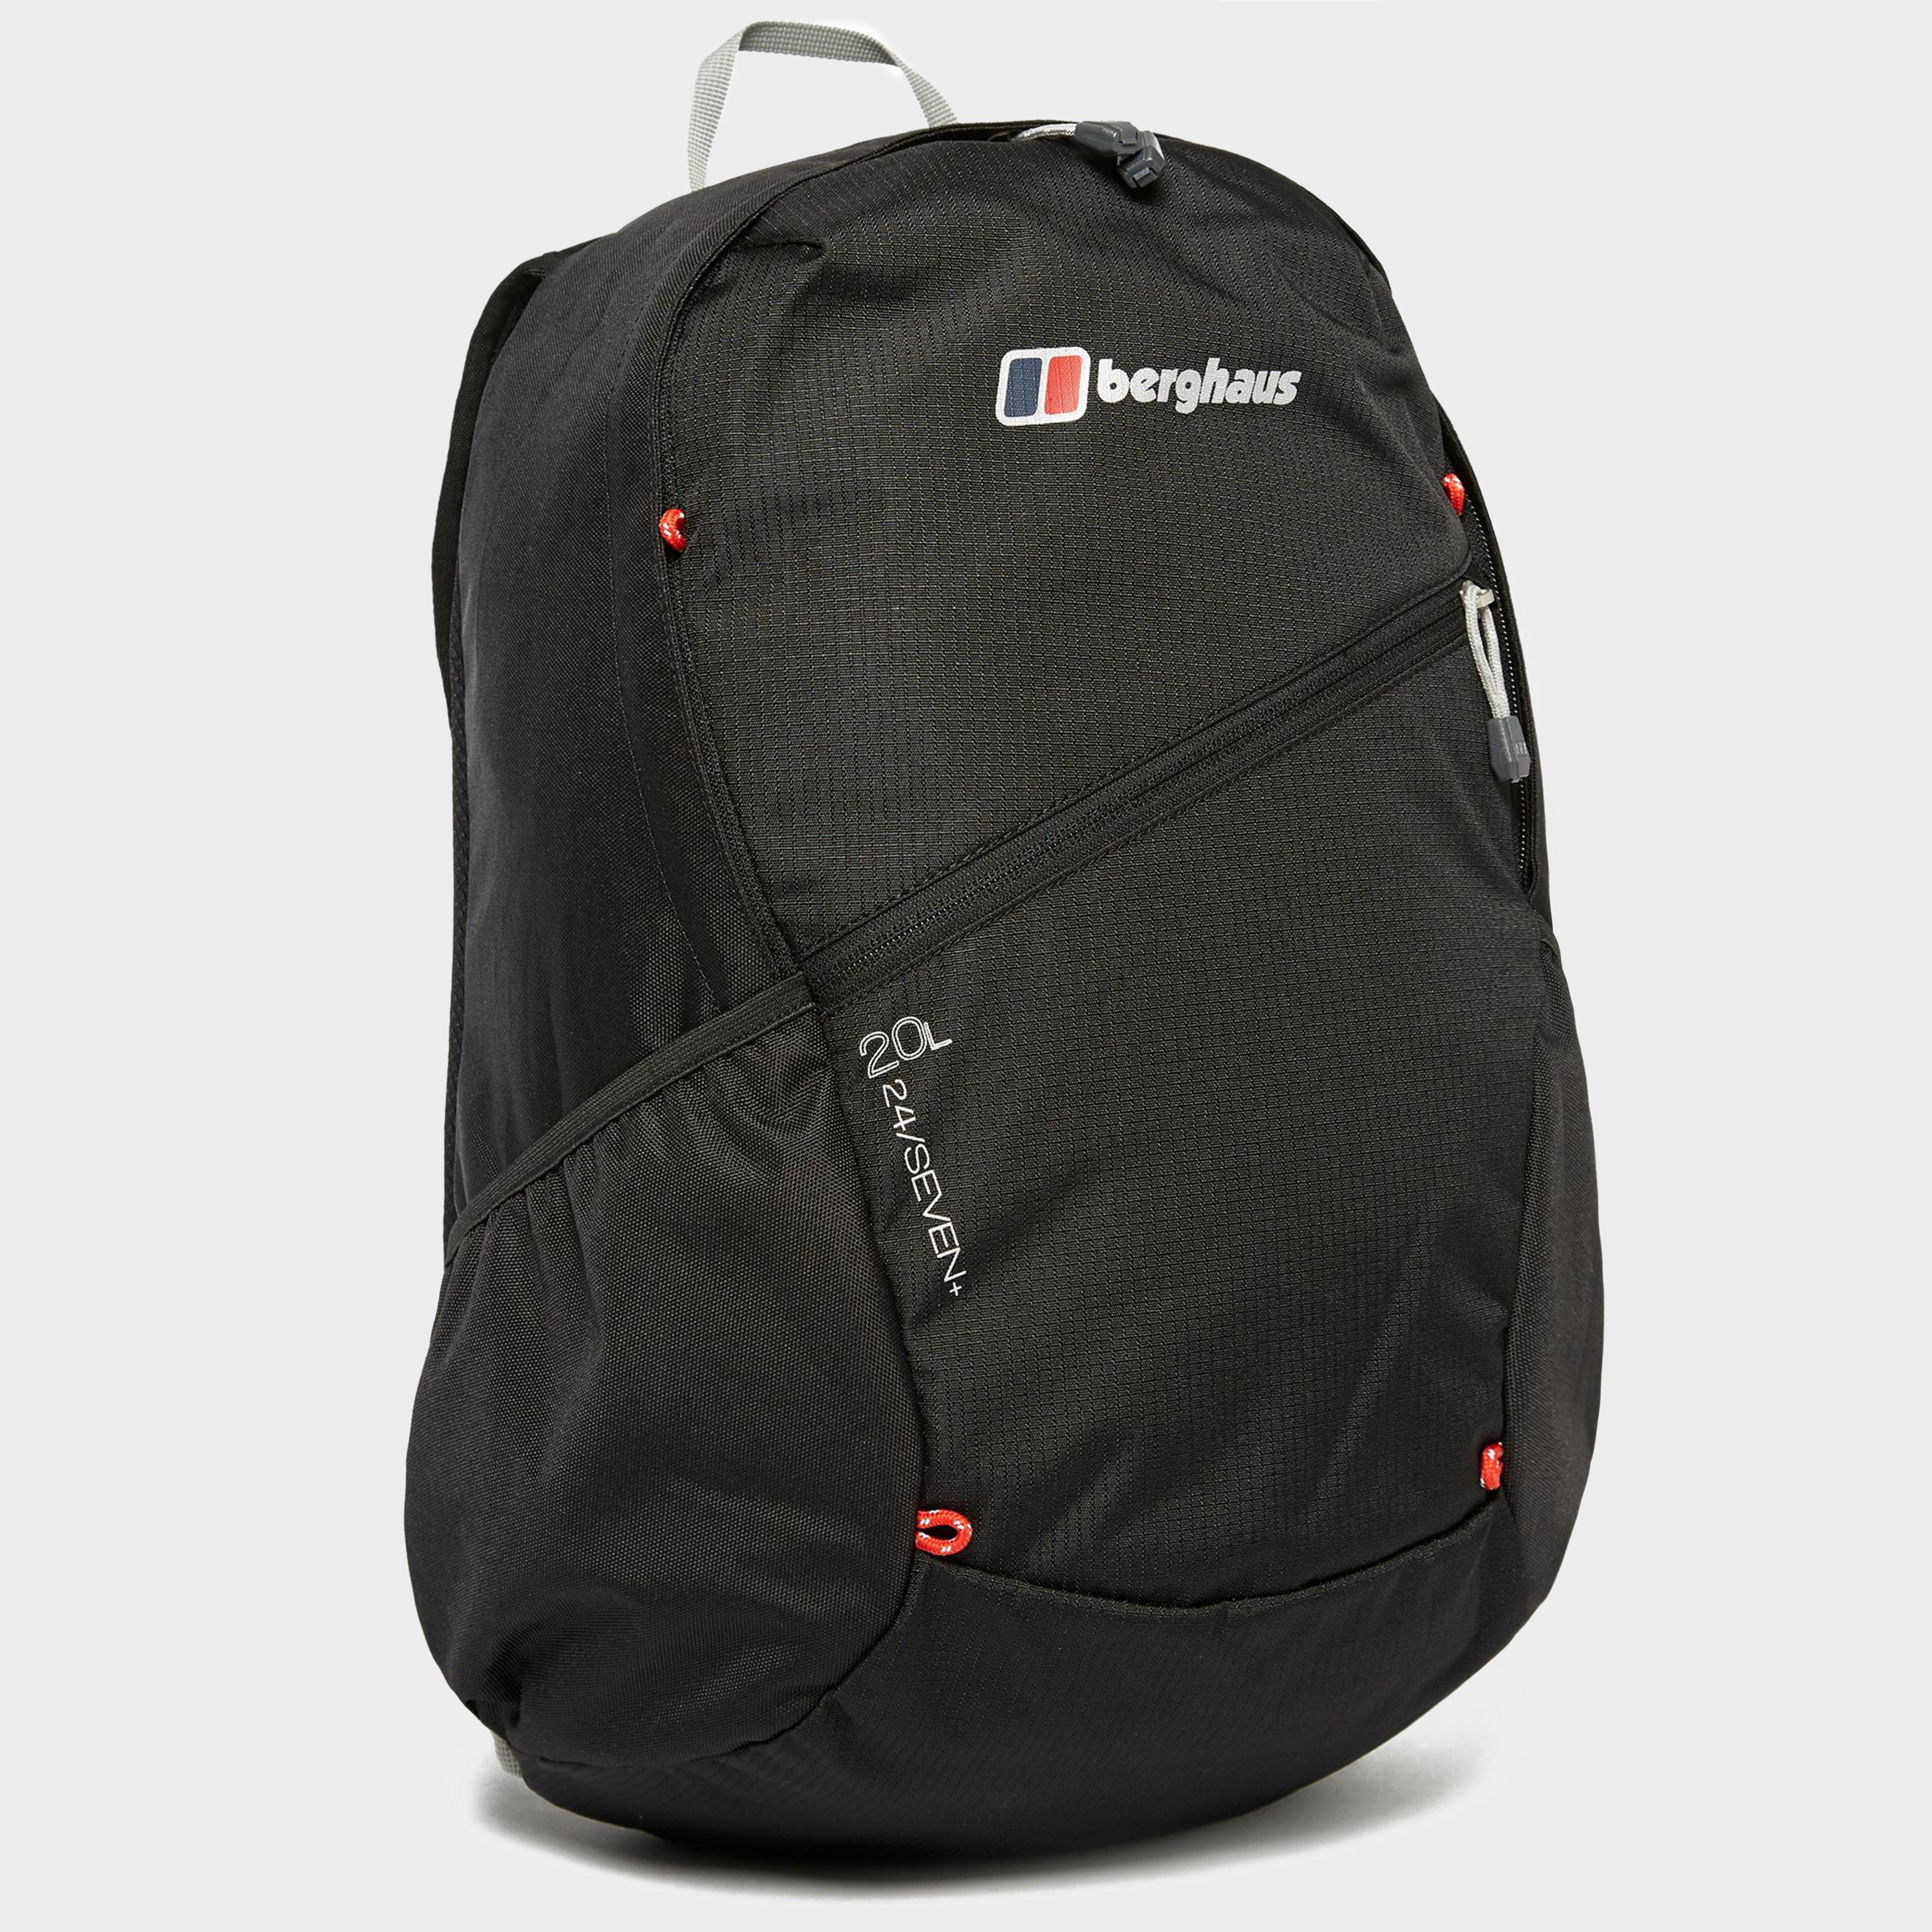 Berghaus Twentyfourseven 20l Daysack - Black/black  Black/black